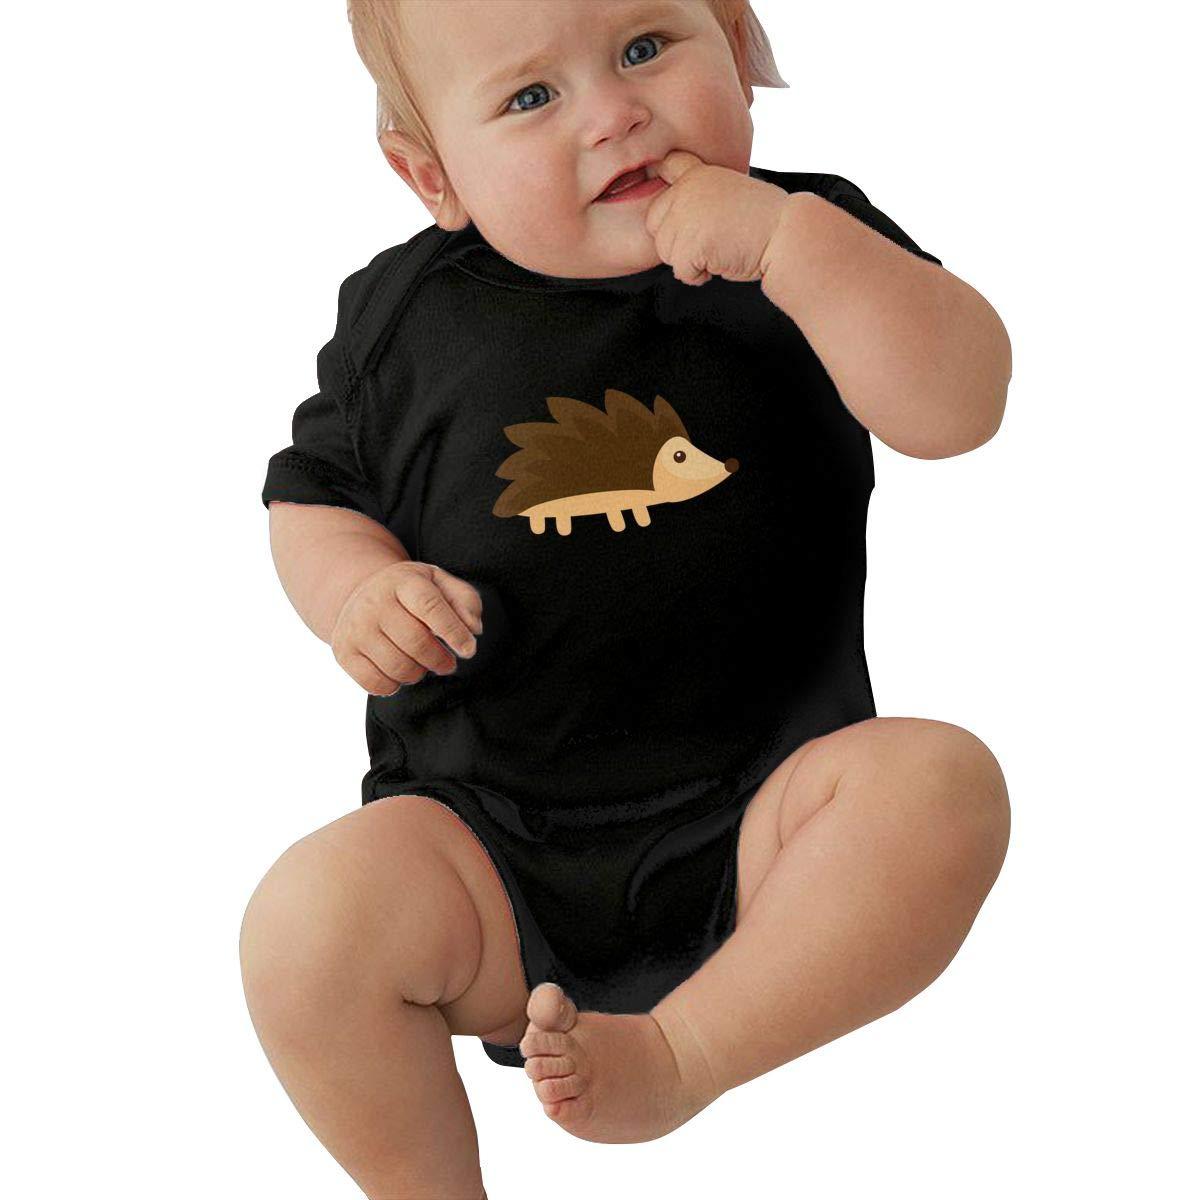 Toddler Baby Boys Bodysuit Short-Sleeve Onesie Hedgehog Print Outfit